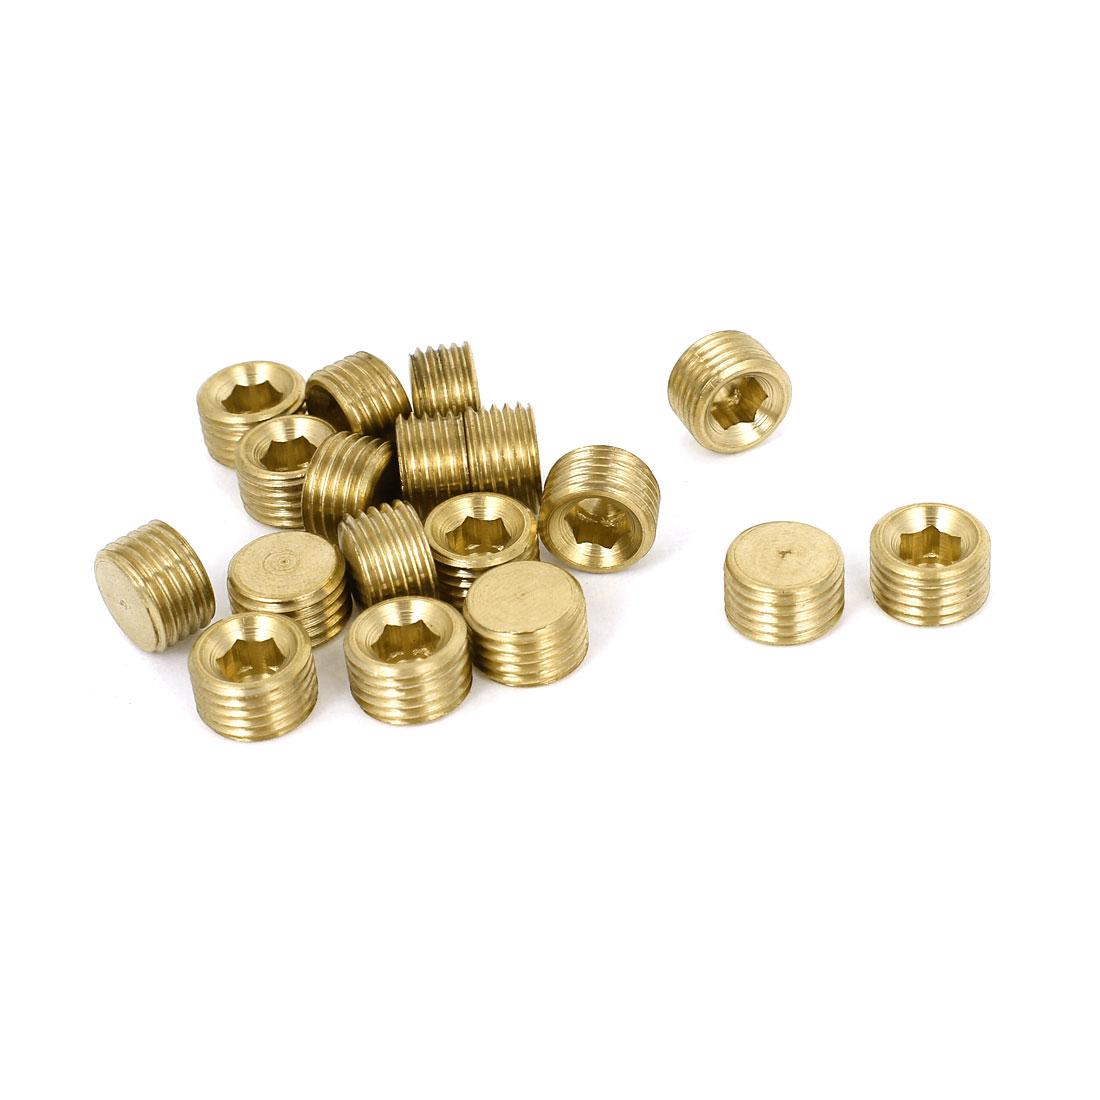 18 Pcs Air Pneumatic 1/4BSP Thread Brass Hex Head Pipe Contector Fastener